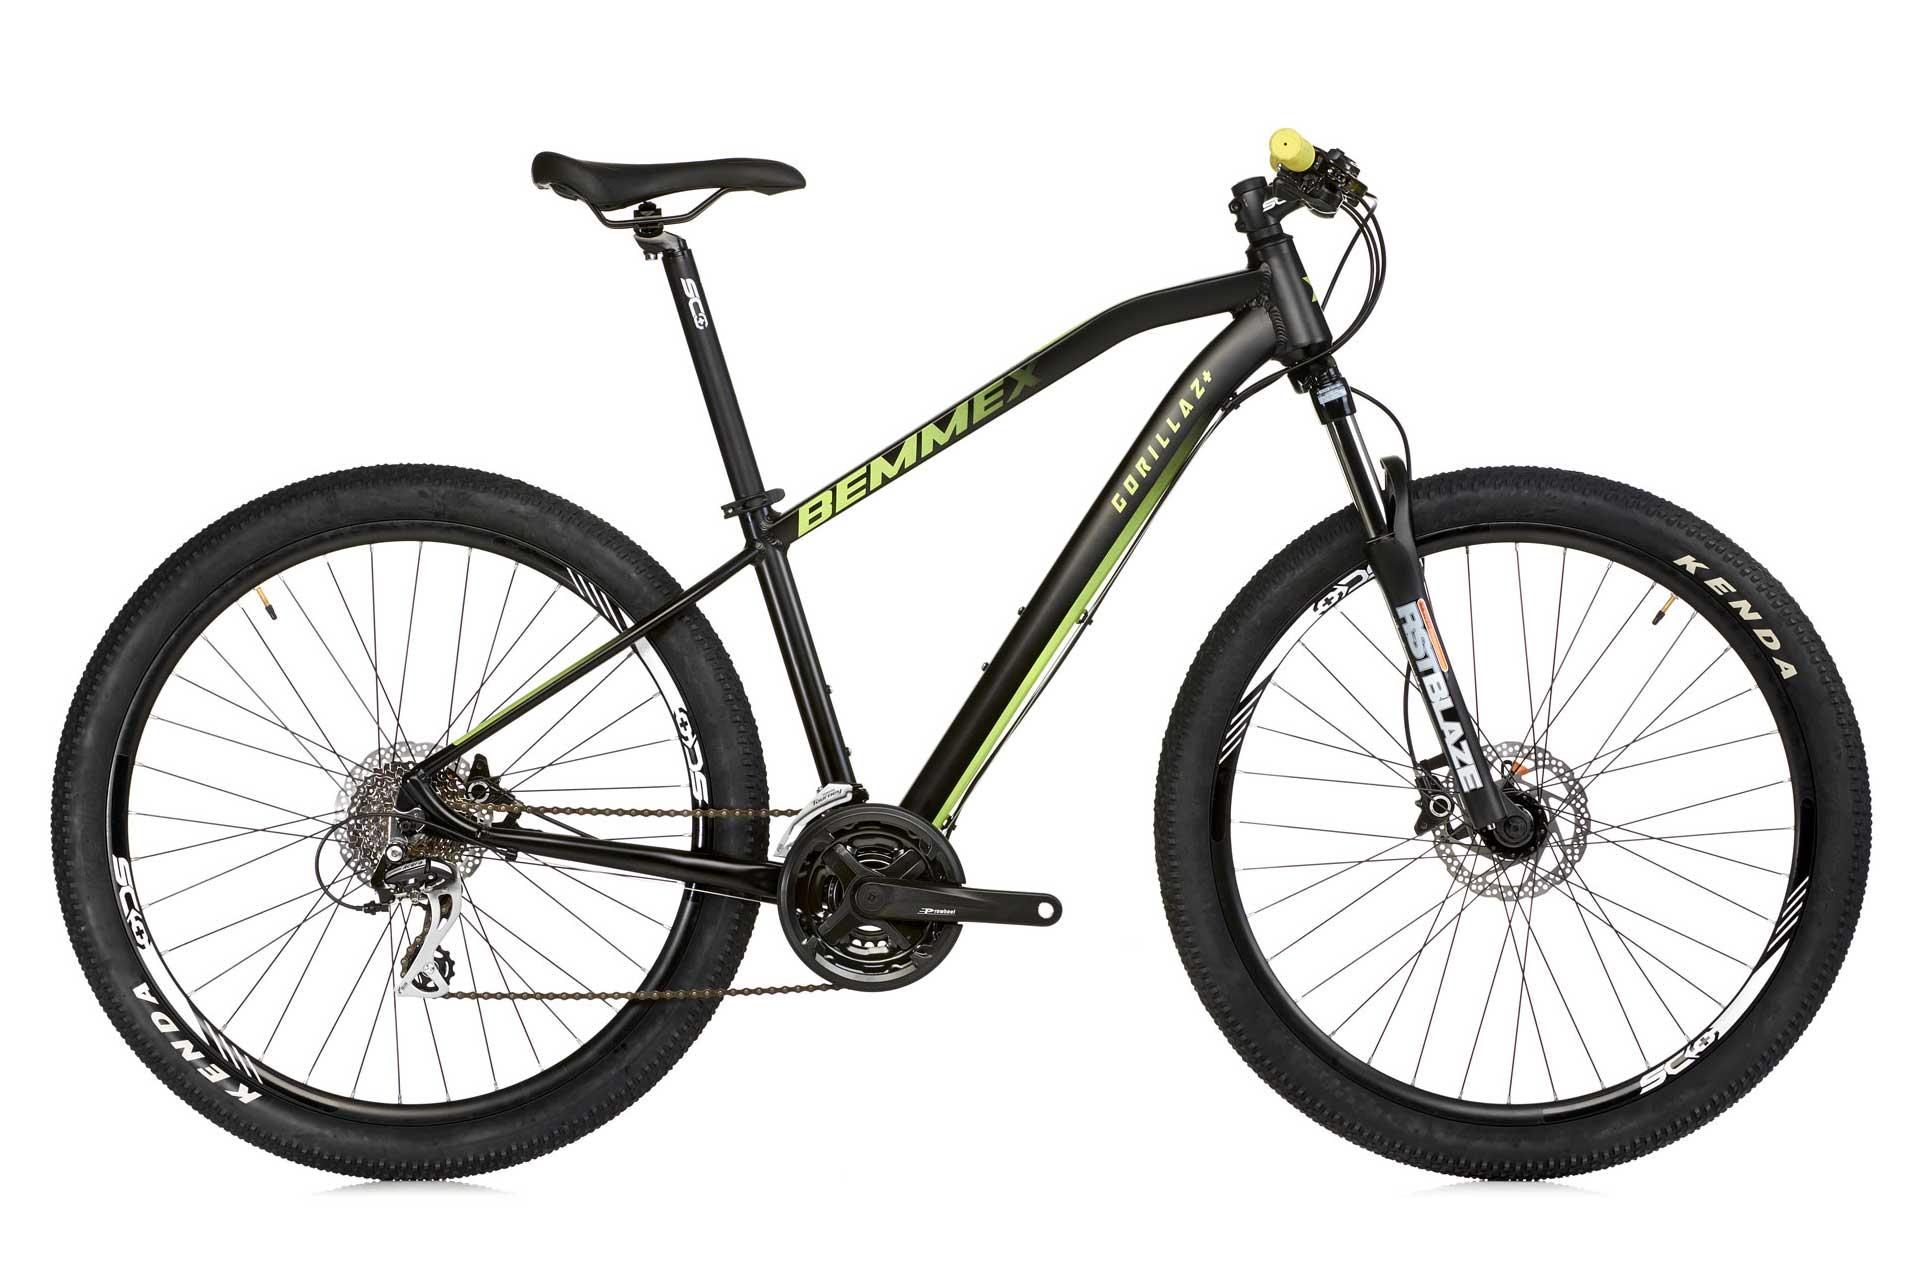 Sardinia Bike Green Group Bemmex Gorillaz 1